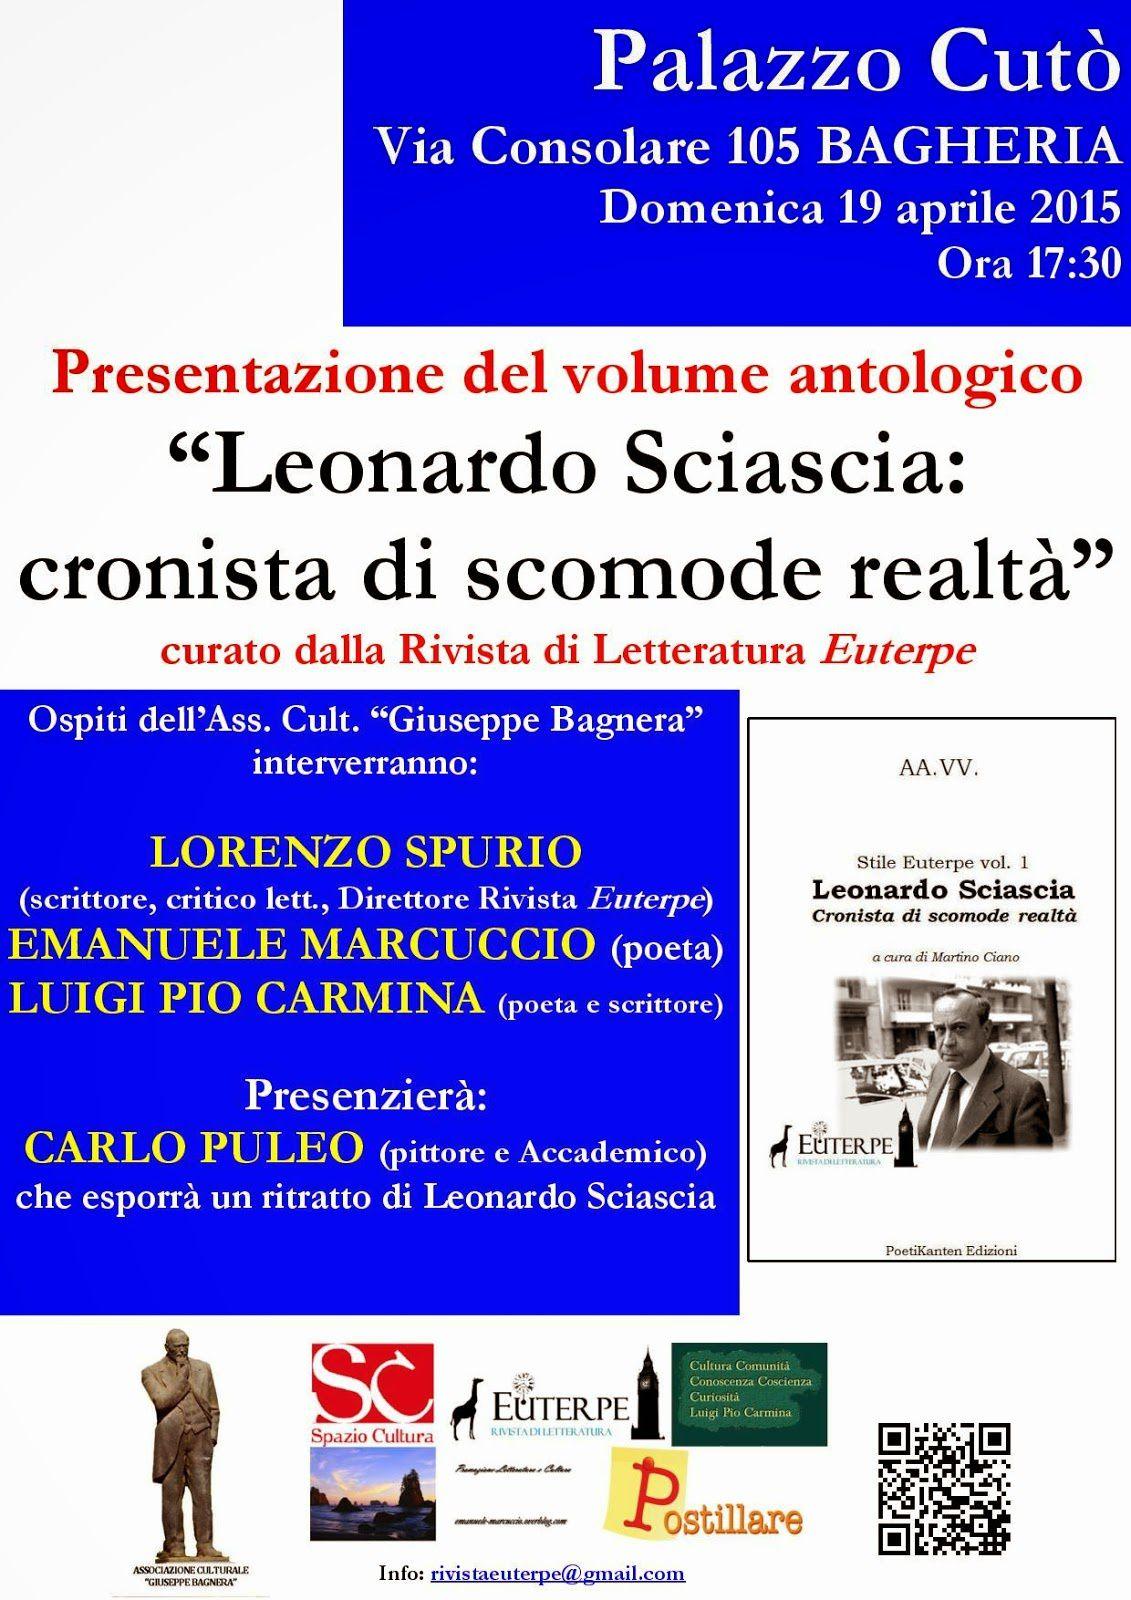 Bagheria (PA), 19-4-2015: si è presentato «Leonardo Sciascia. Cronista di scomode realtà»